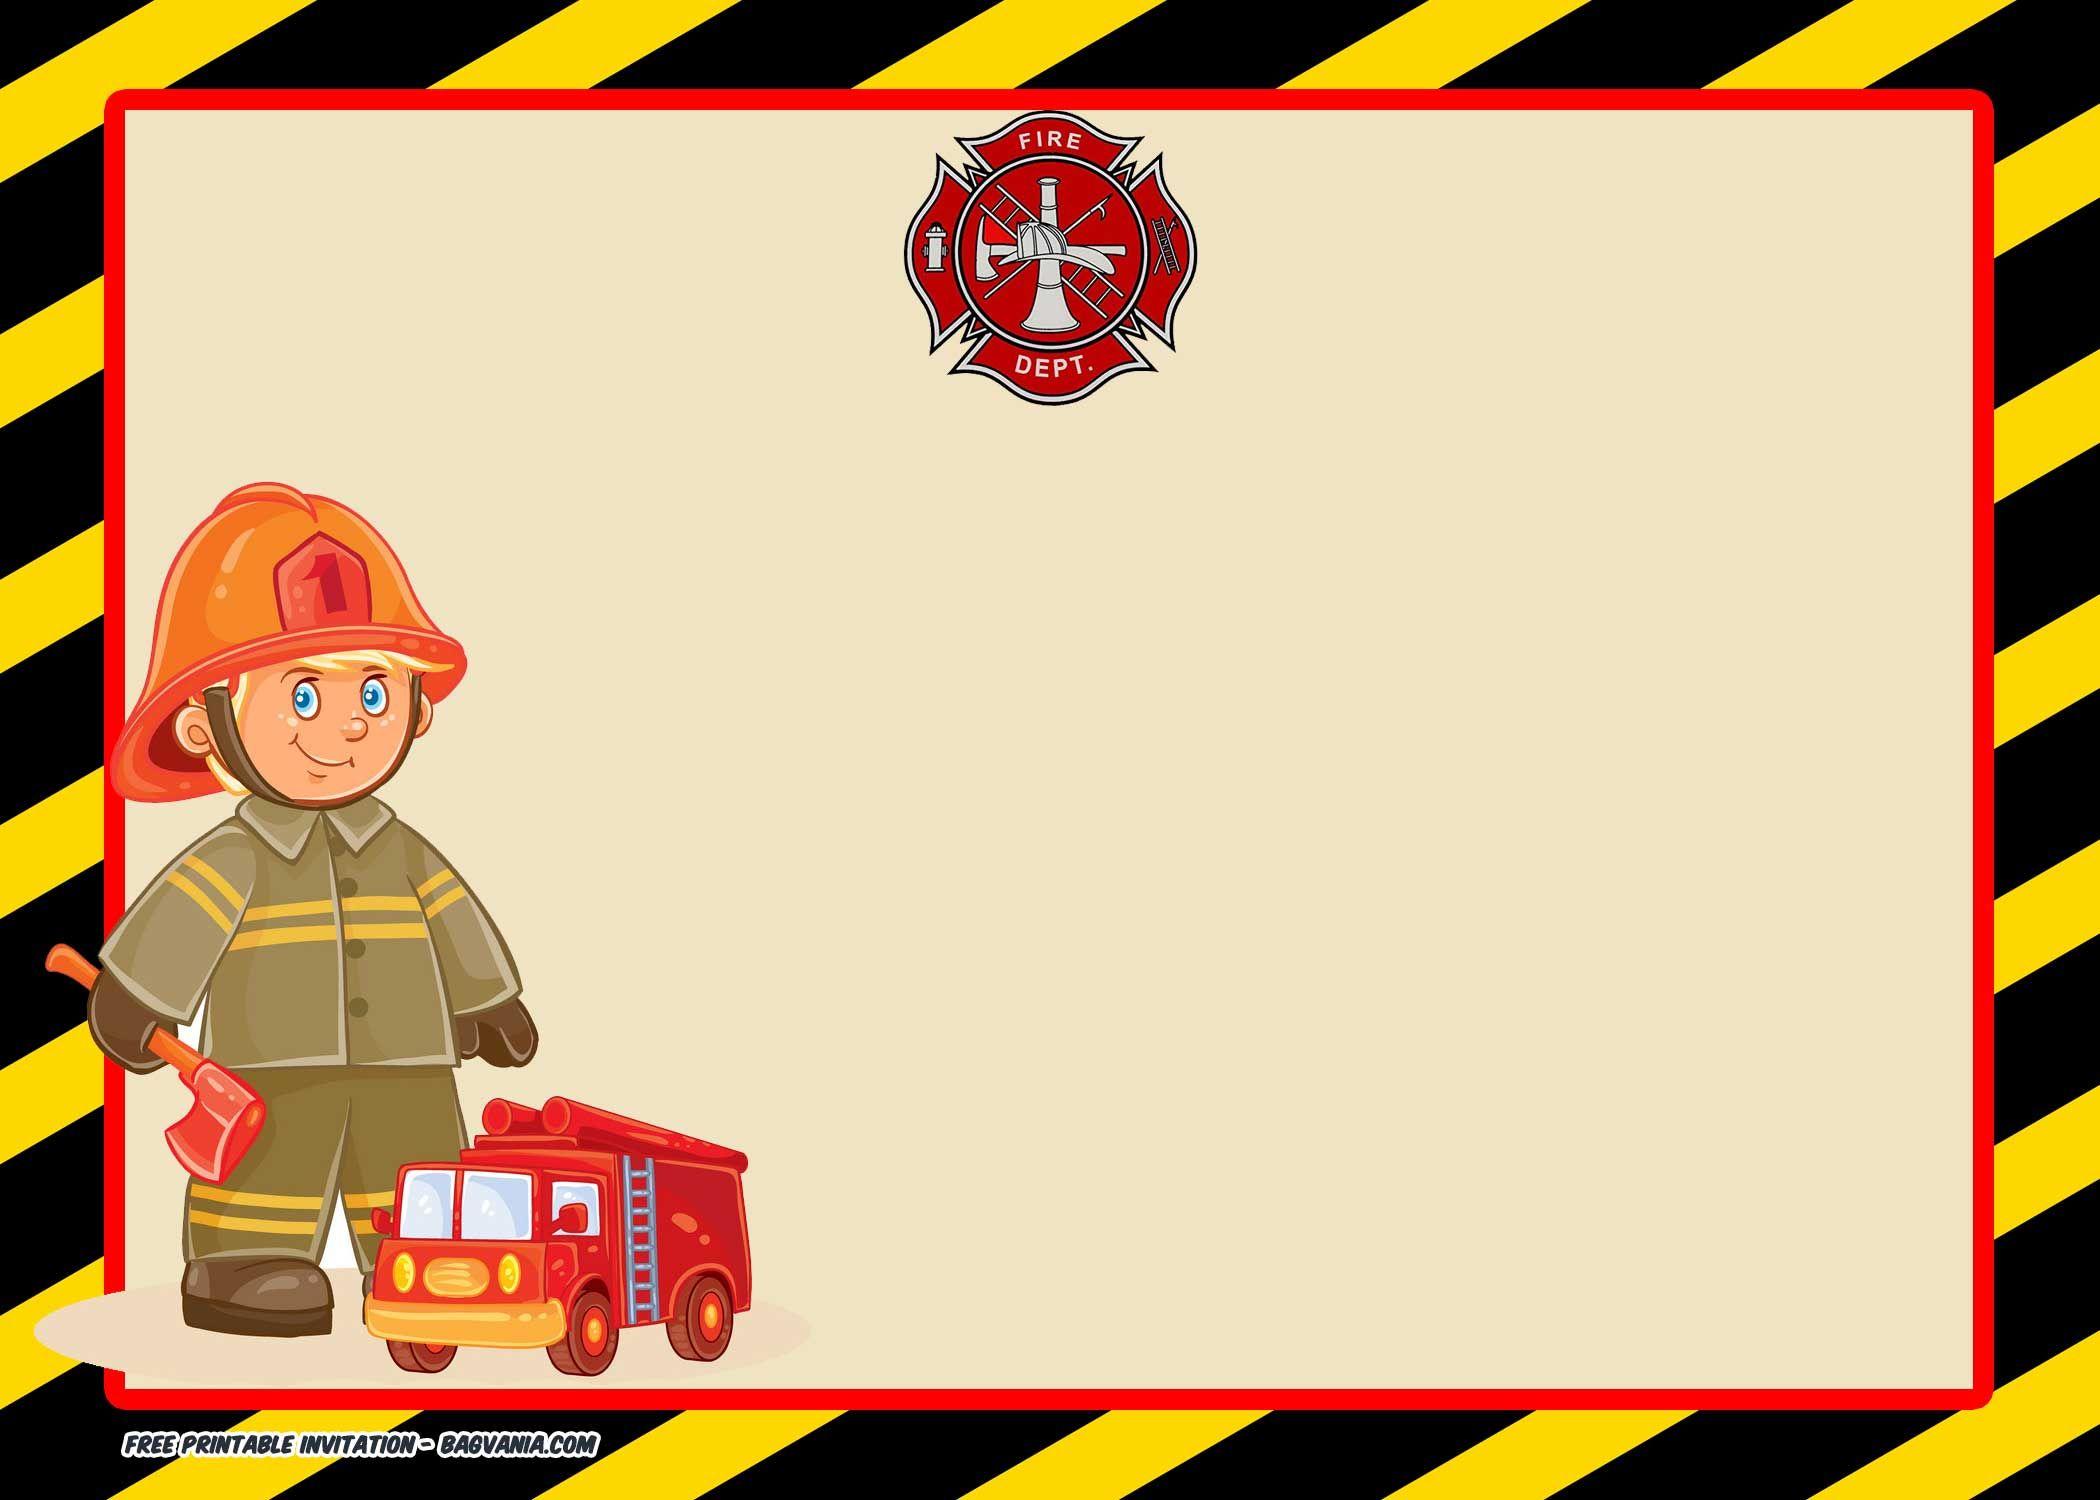 Free Printable Fireman Invitation Templates Free Printable Invitations Templates Free Printable Birthday Invitations Firefighter Birthday